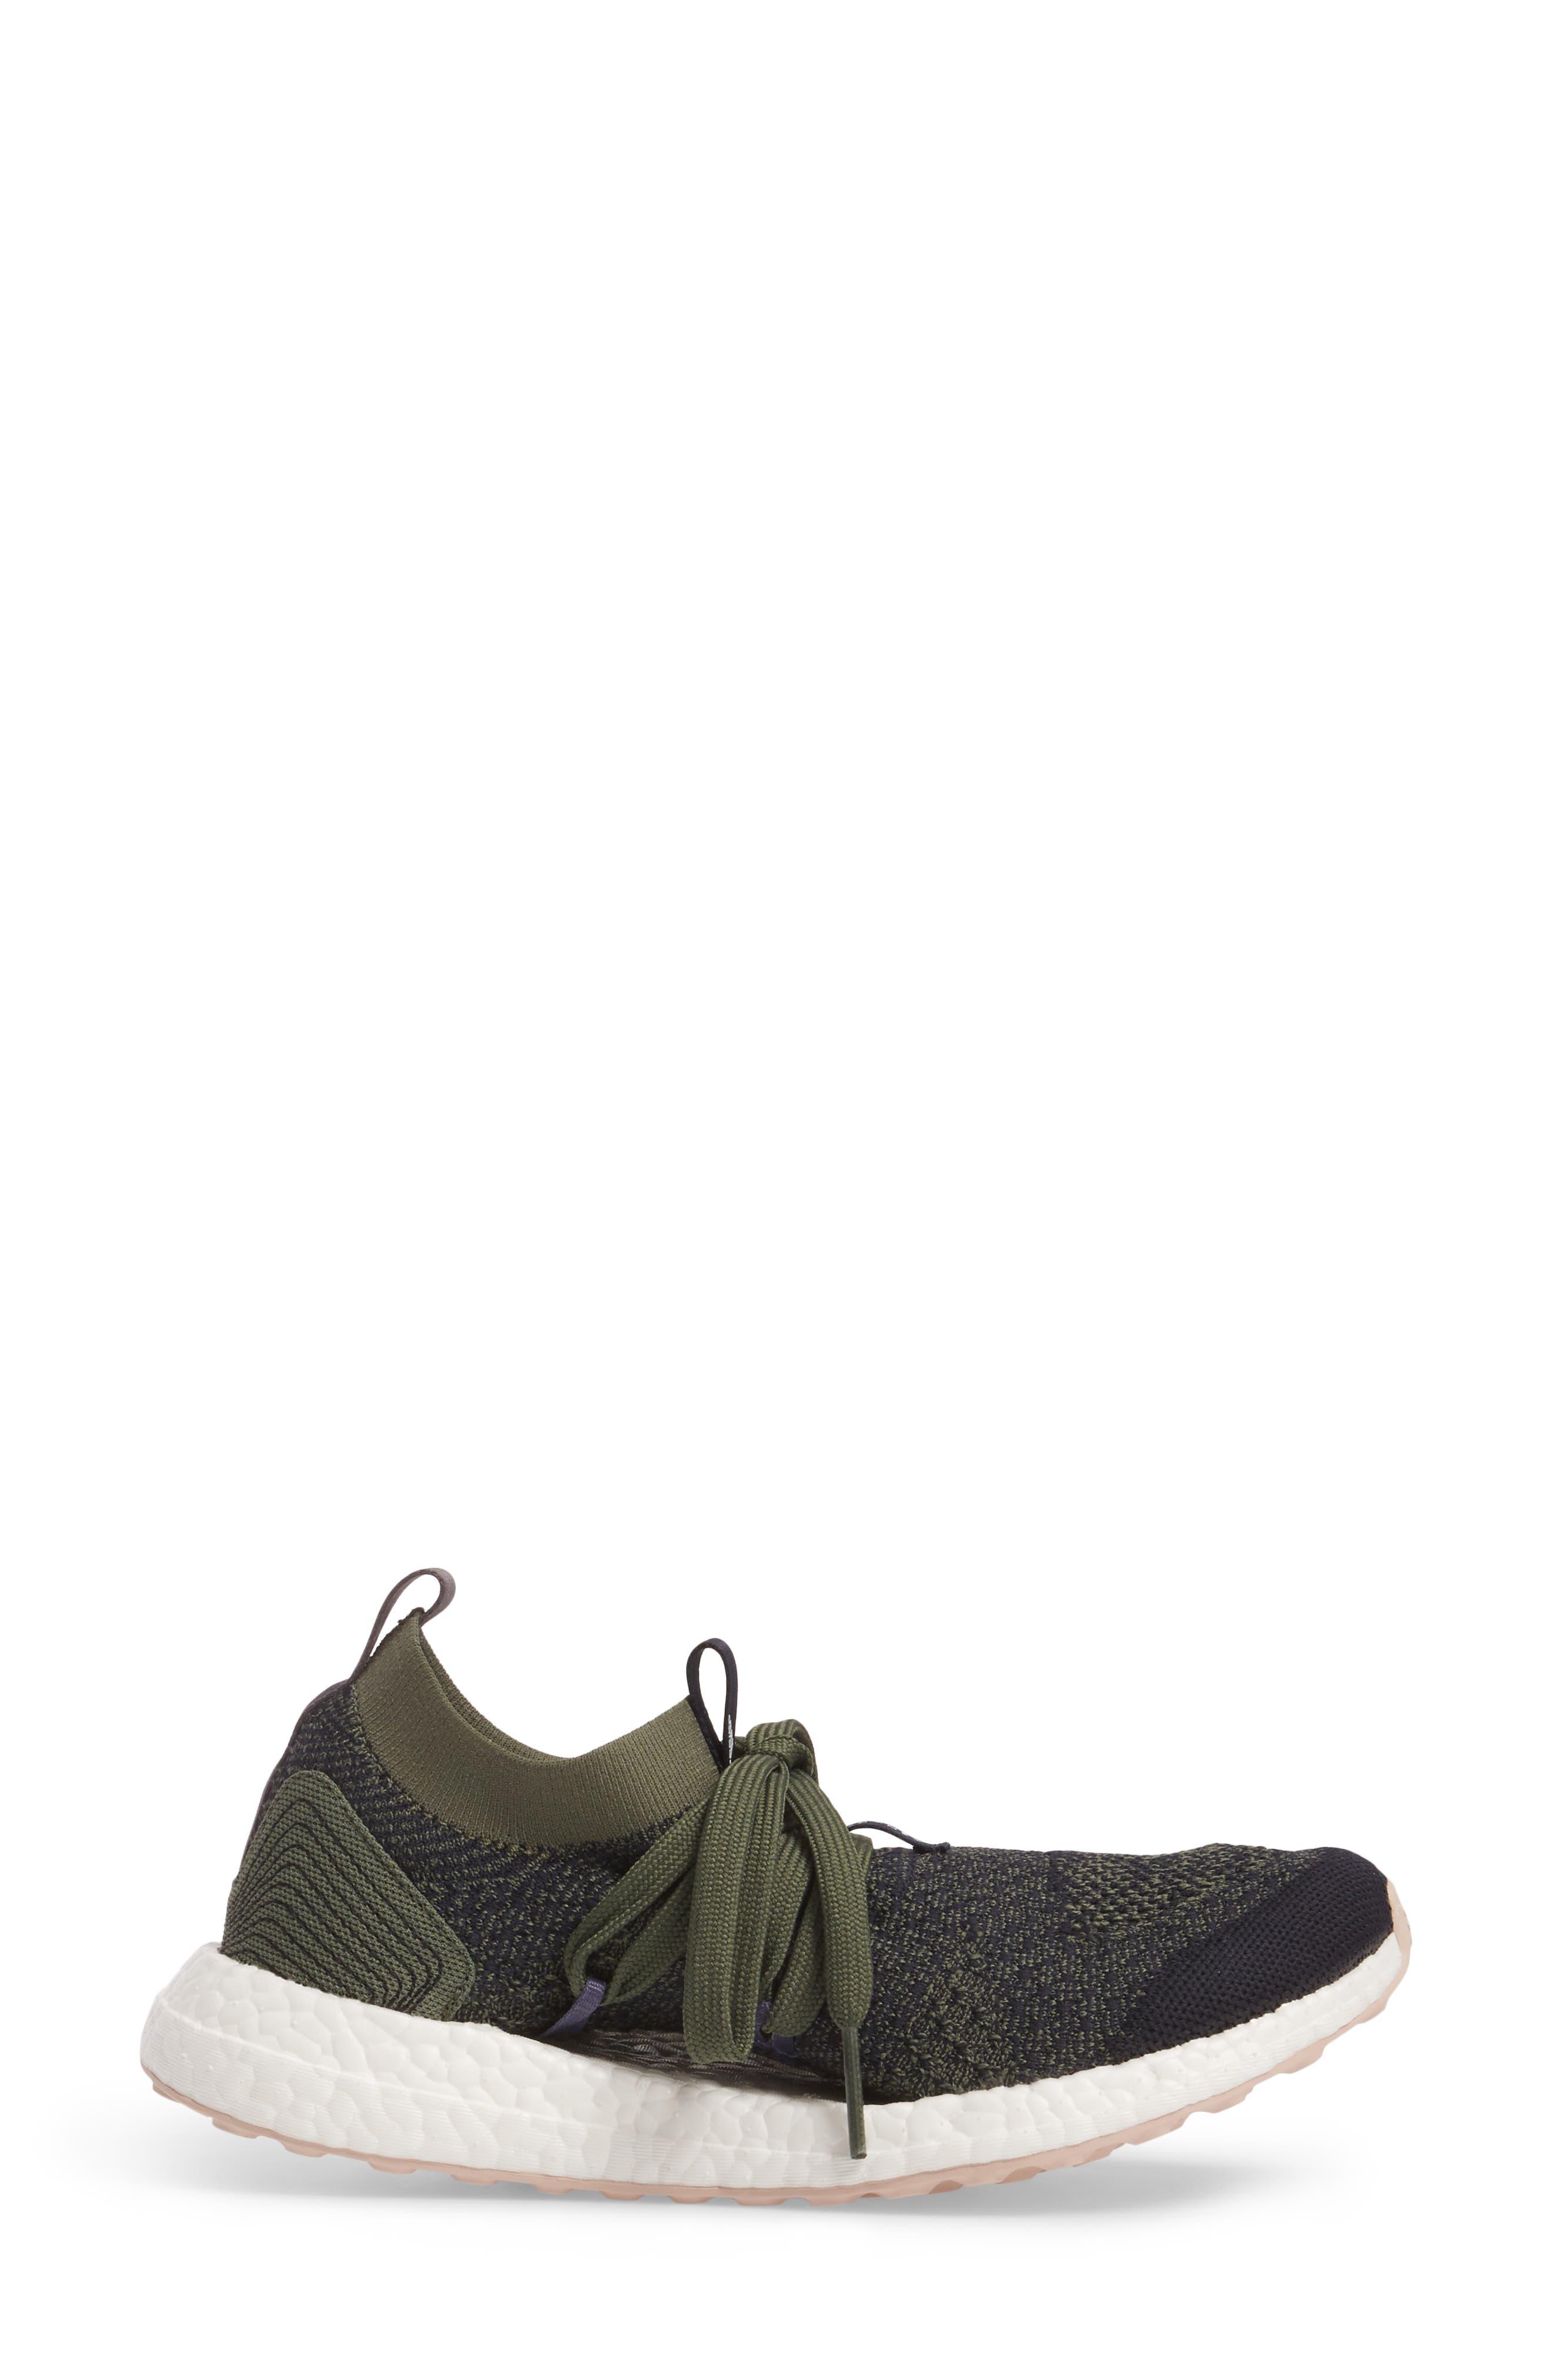 Alternate Image 3  - adidas by Stella McCartney UltraBOOST x Parley Running Shoe (Women)